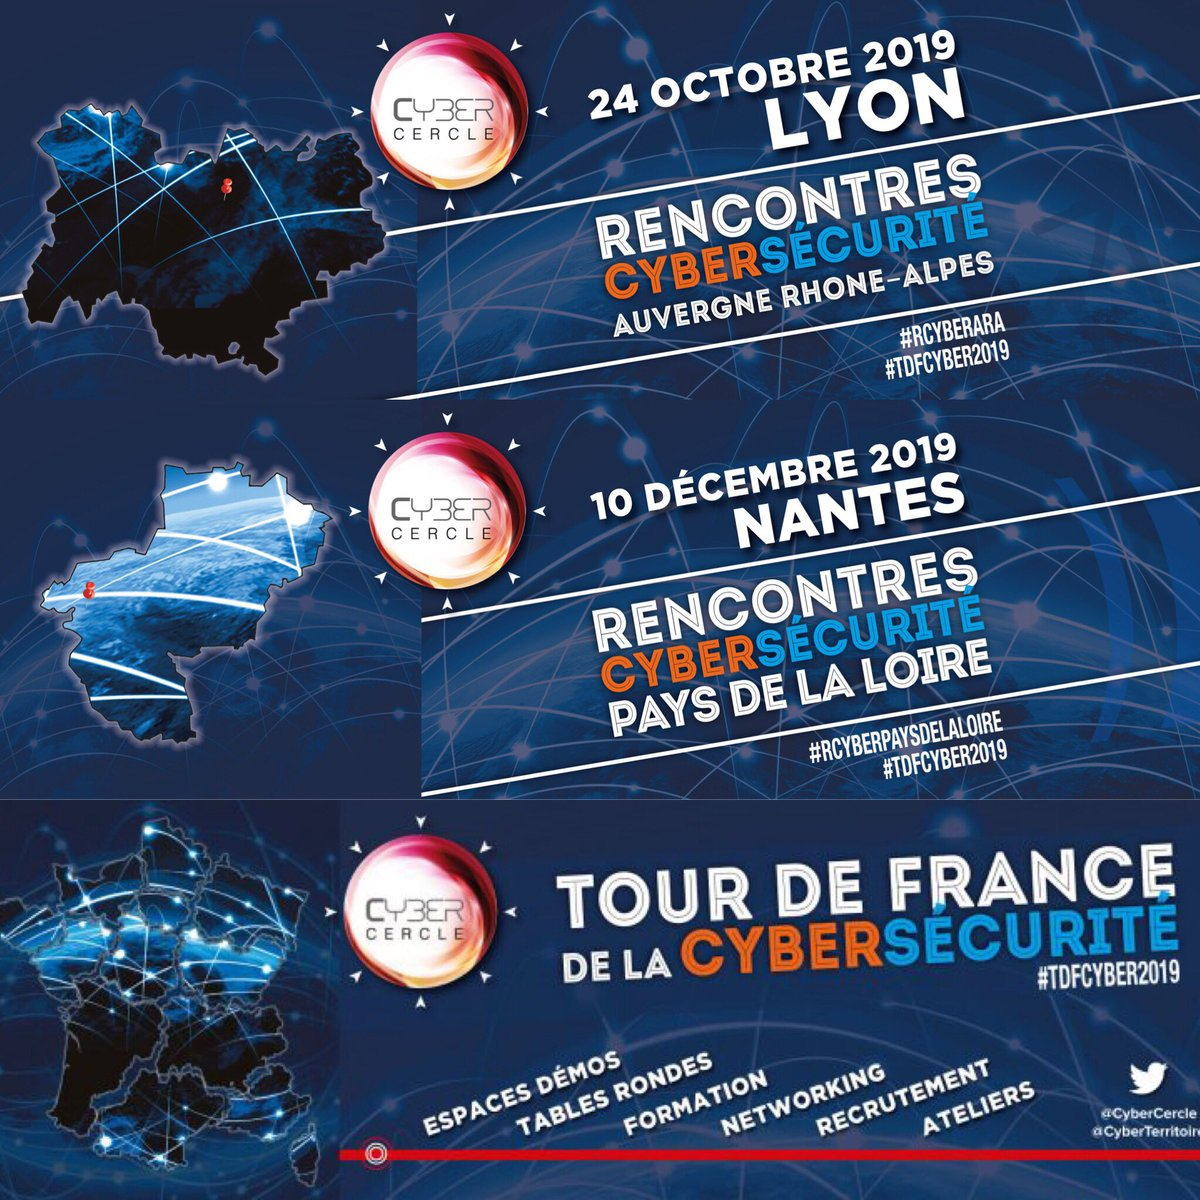 [SAVE THE DATE]  Etapes du #TDFCYBER2019  • 24 octobre, Lyon #RCyberARA • 10 décembre, Nantes #RCyberPaysdelaLoire  #cybersecurite #territoires #securite #numerique #surleterrain #culturesecuritenumerique #collterr #pmepmi #innovation #formation #recrutement #transfonumerique